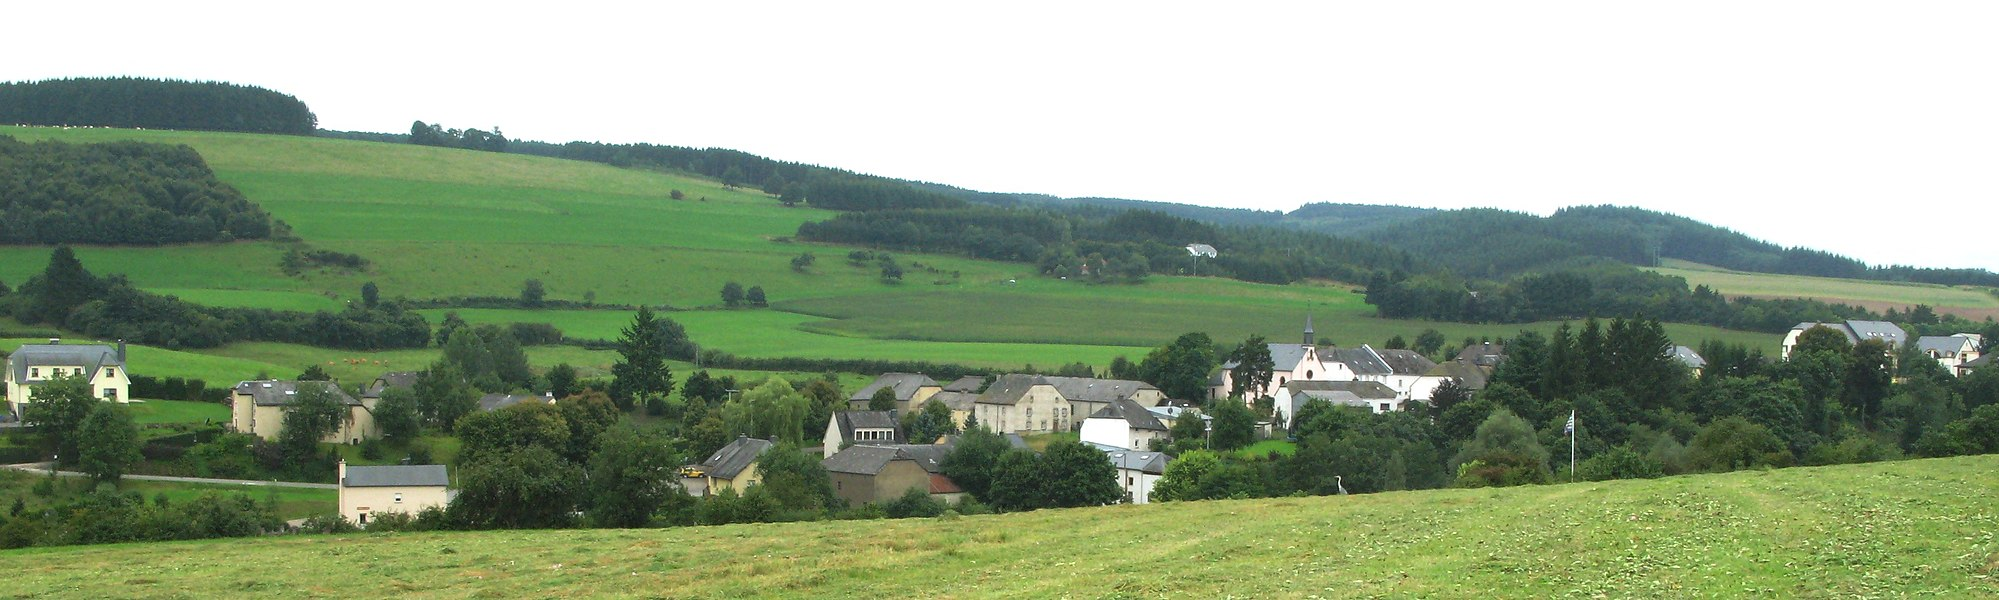 Le village luxembourgeois de Winseler vu des hauteurs du Schëllerfeld